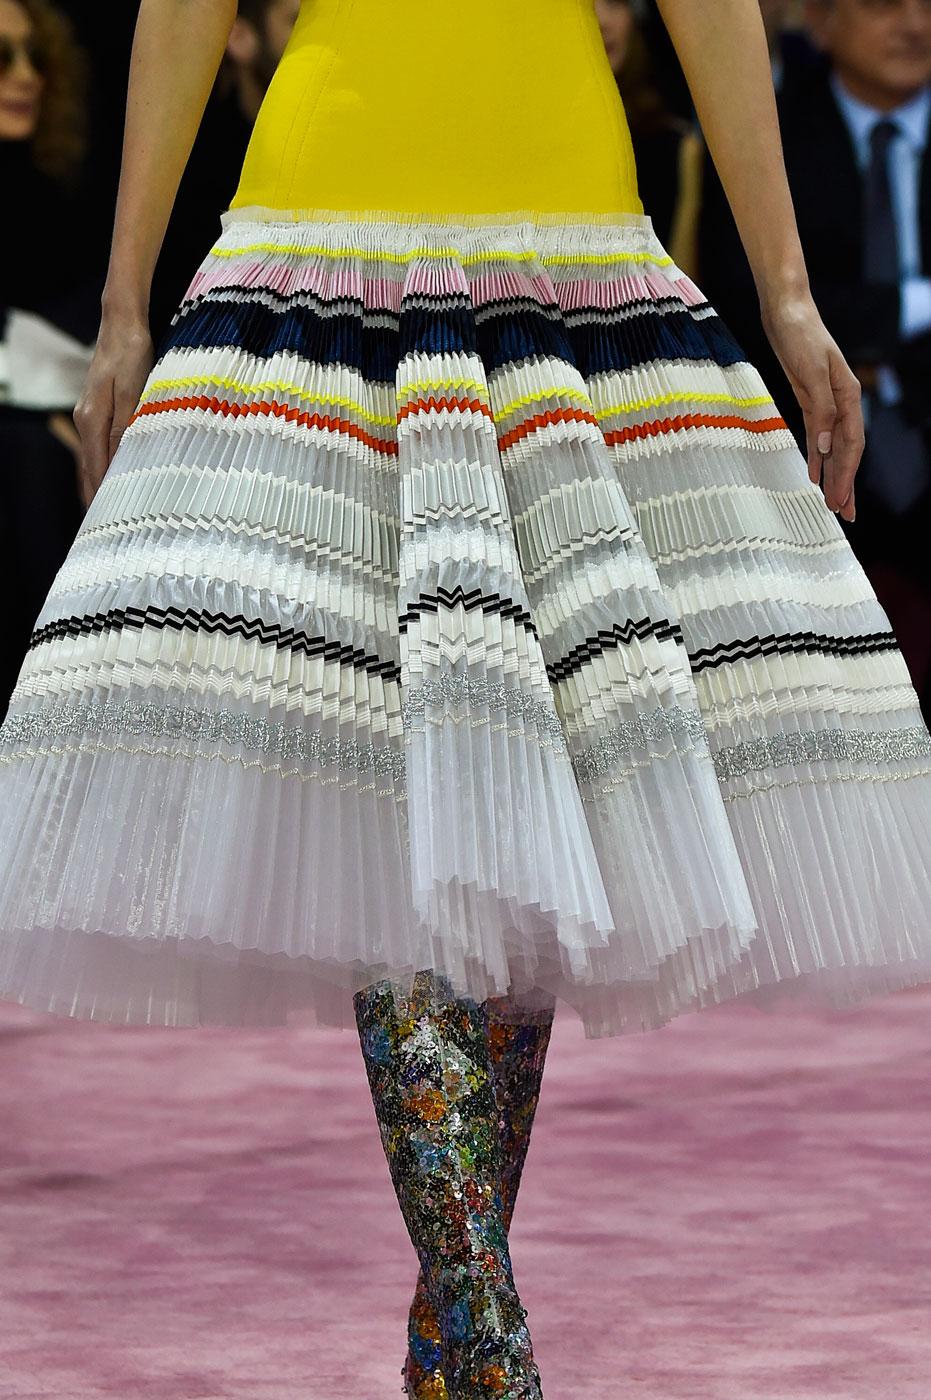 Christian-Dior-fashion-runway-show-close-ups-haute-couture-paris-spring-summer-2015-the-impression-130